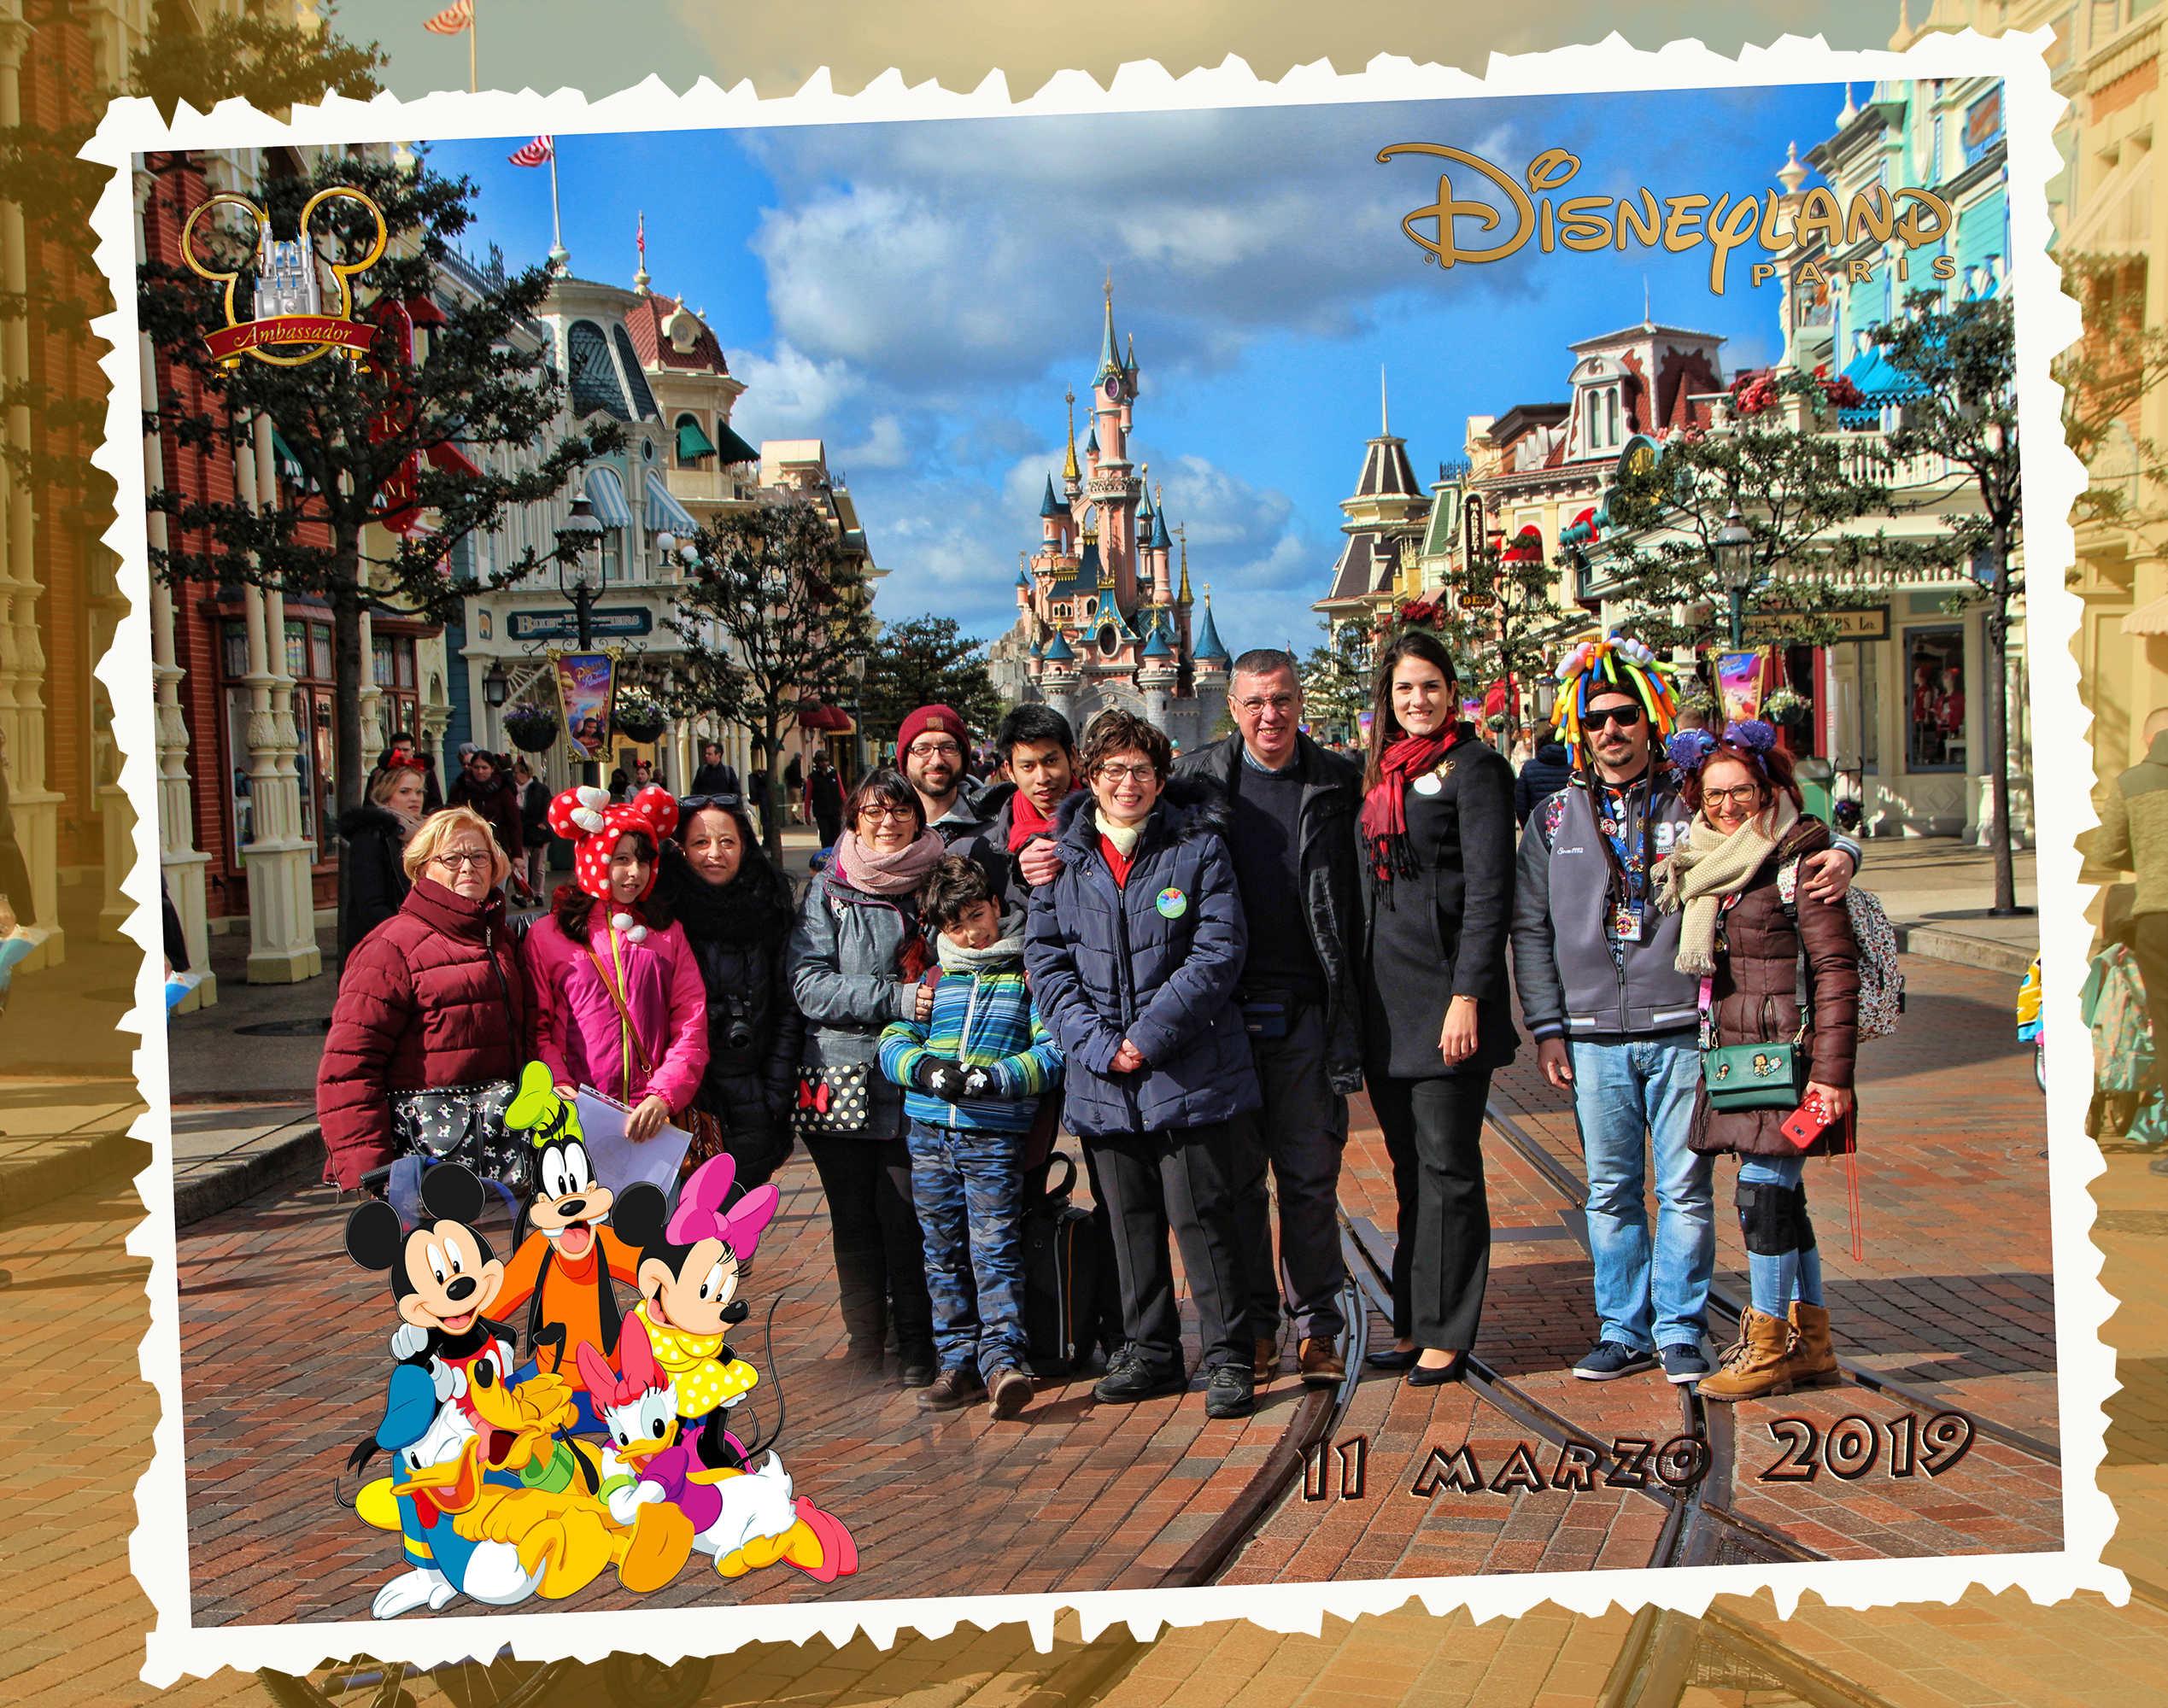 Ambasciatori Disneyland Paris 2019 - 2020 - Pagina 2 Img_8810